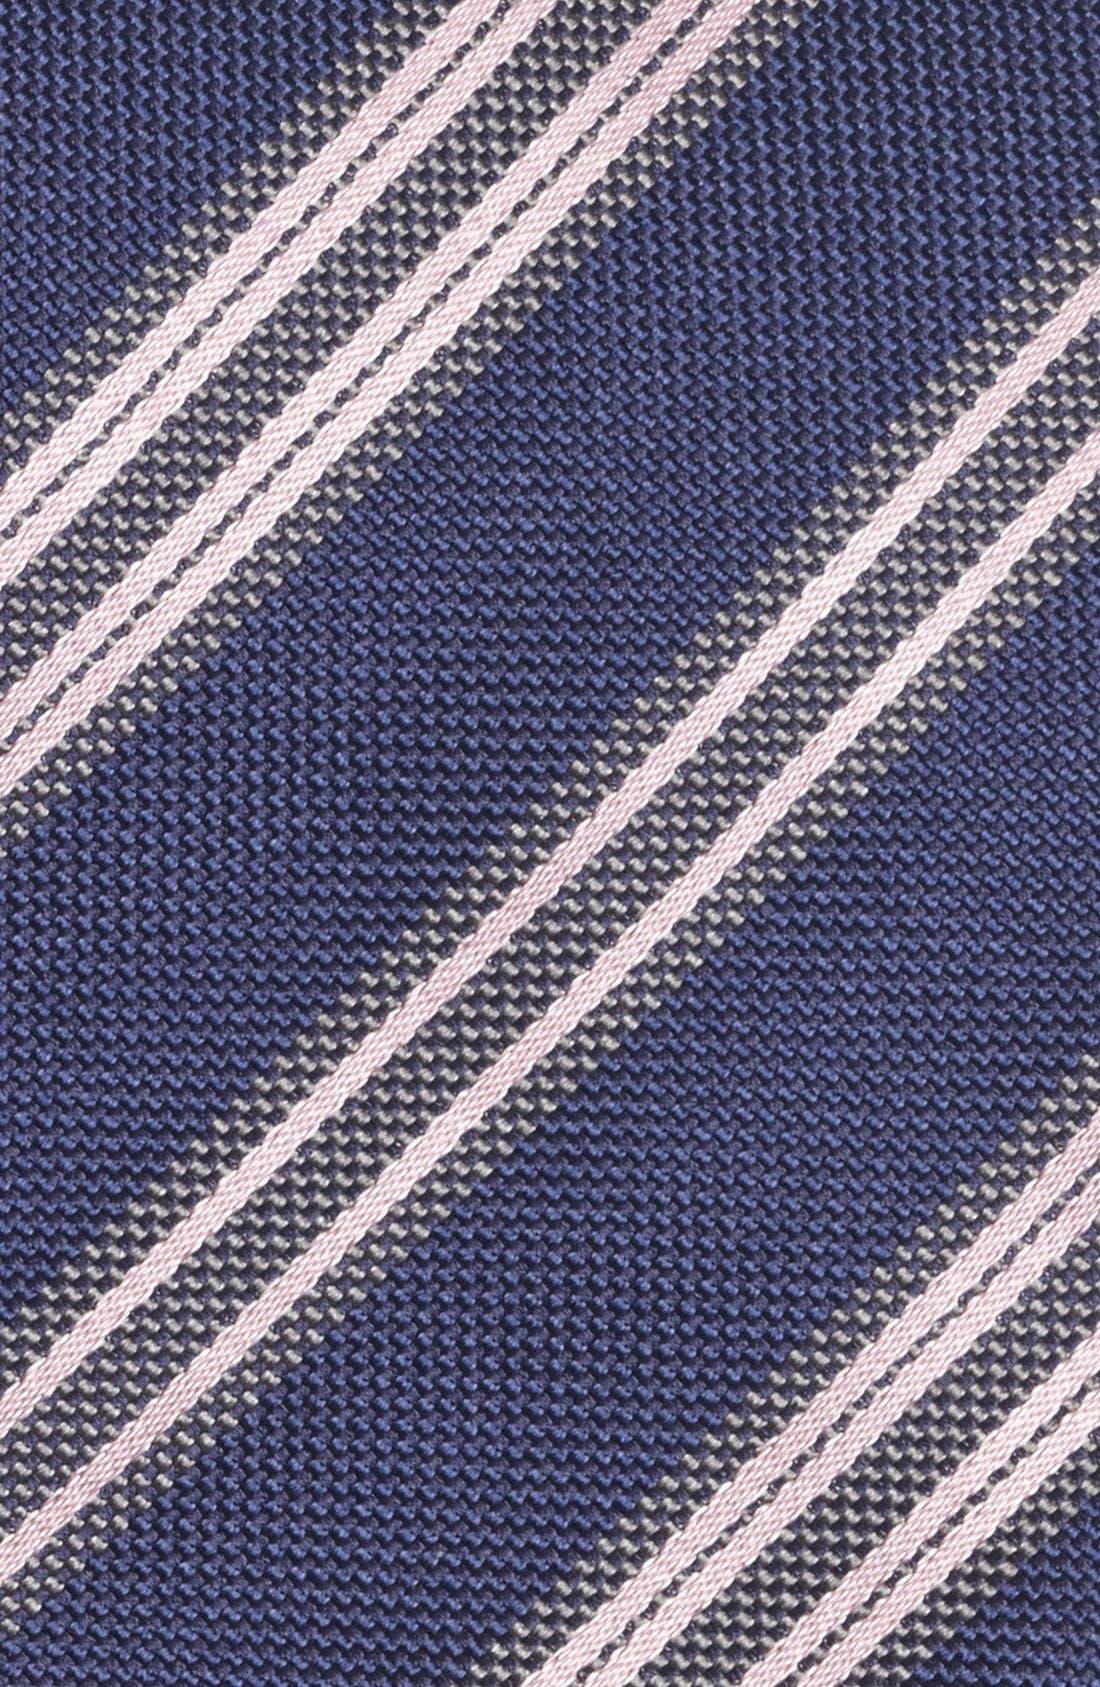 Alternate Image 2  - BOSS HUGO BOSS Woven Silk Tie